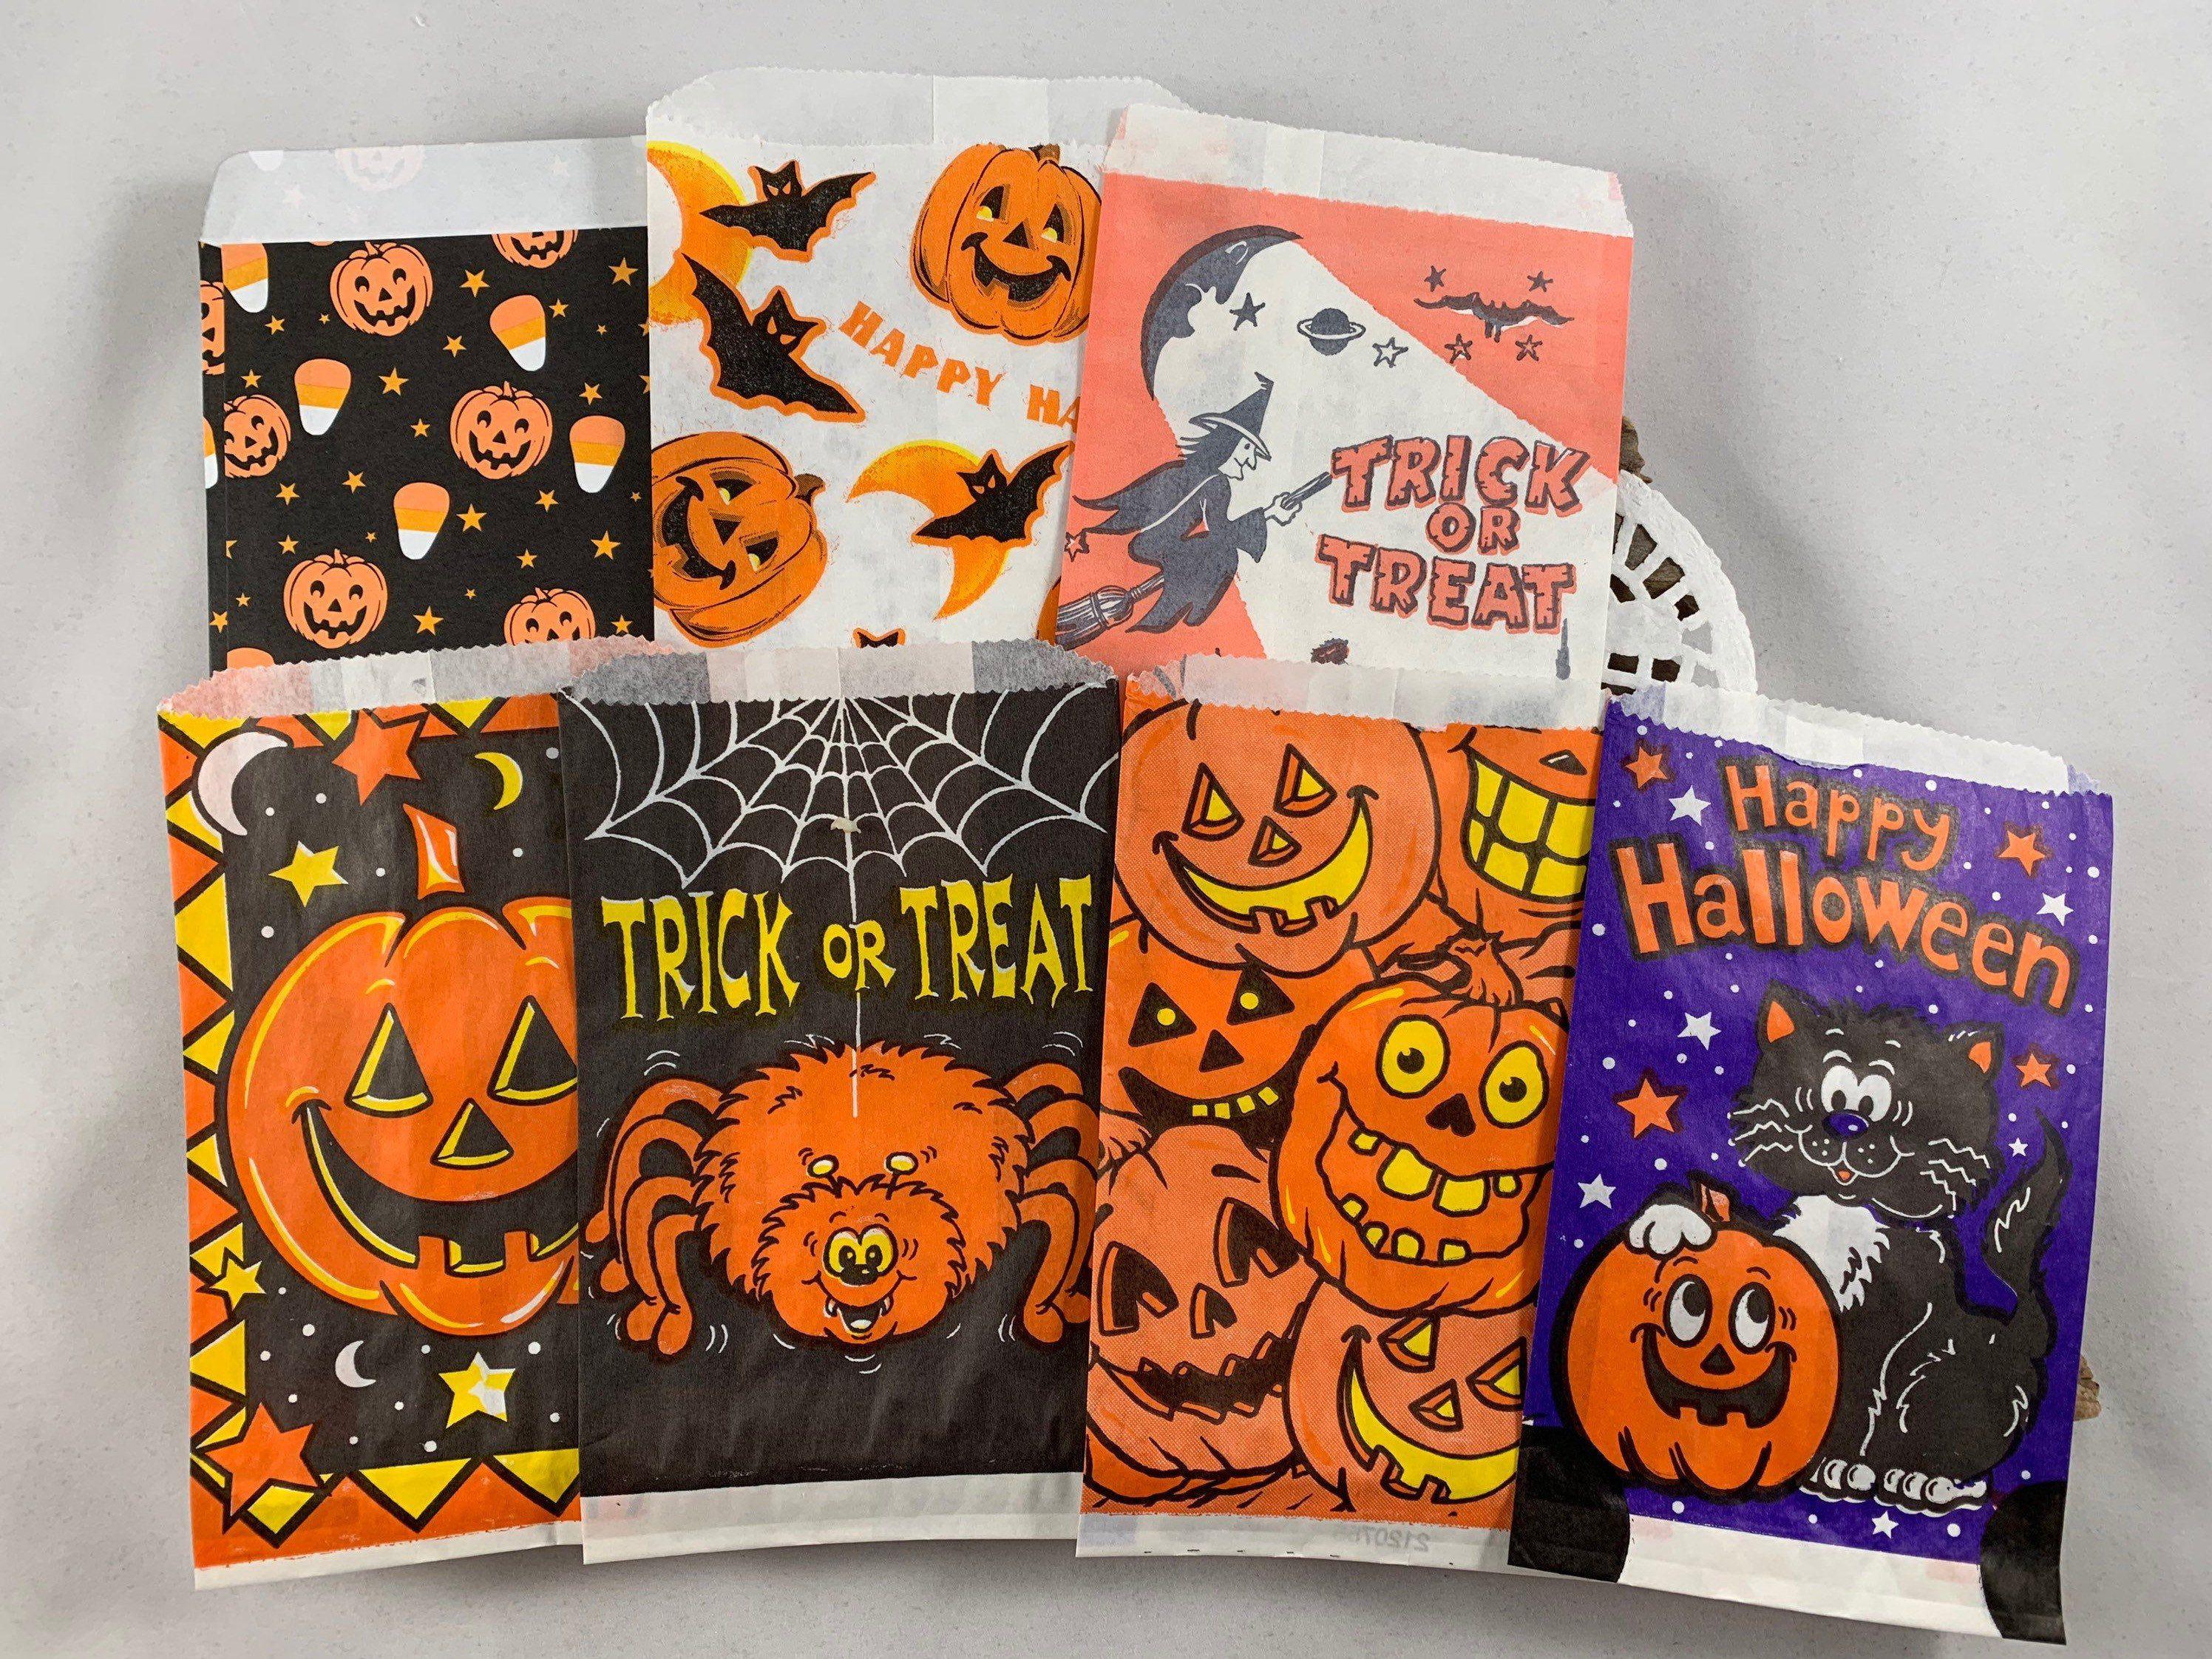 7 Halloween Treat Bags Paper Ephemera Set Vintage Halloween Etsy In 2020 Halloween Treat Bags Vintage Halloween Halloween Treats